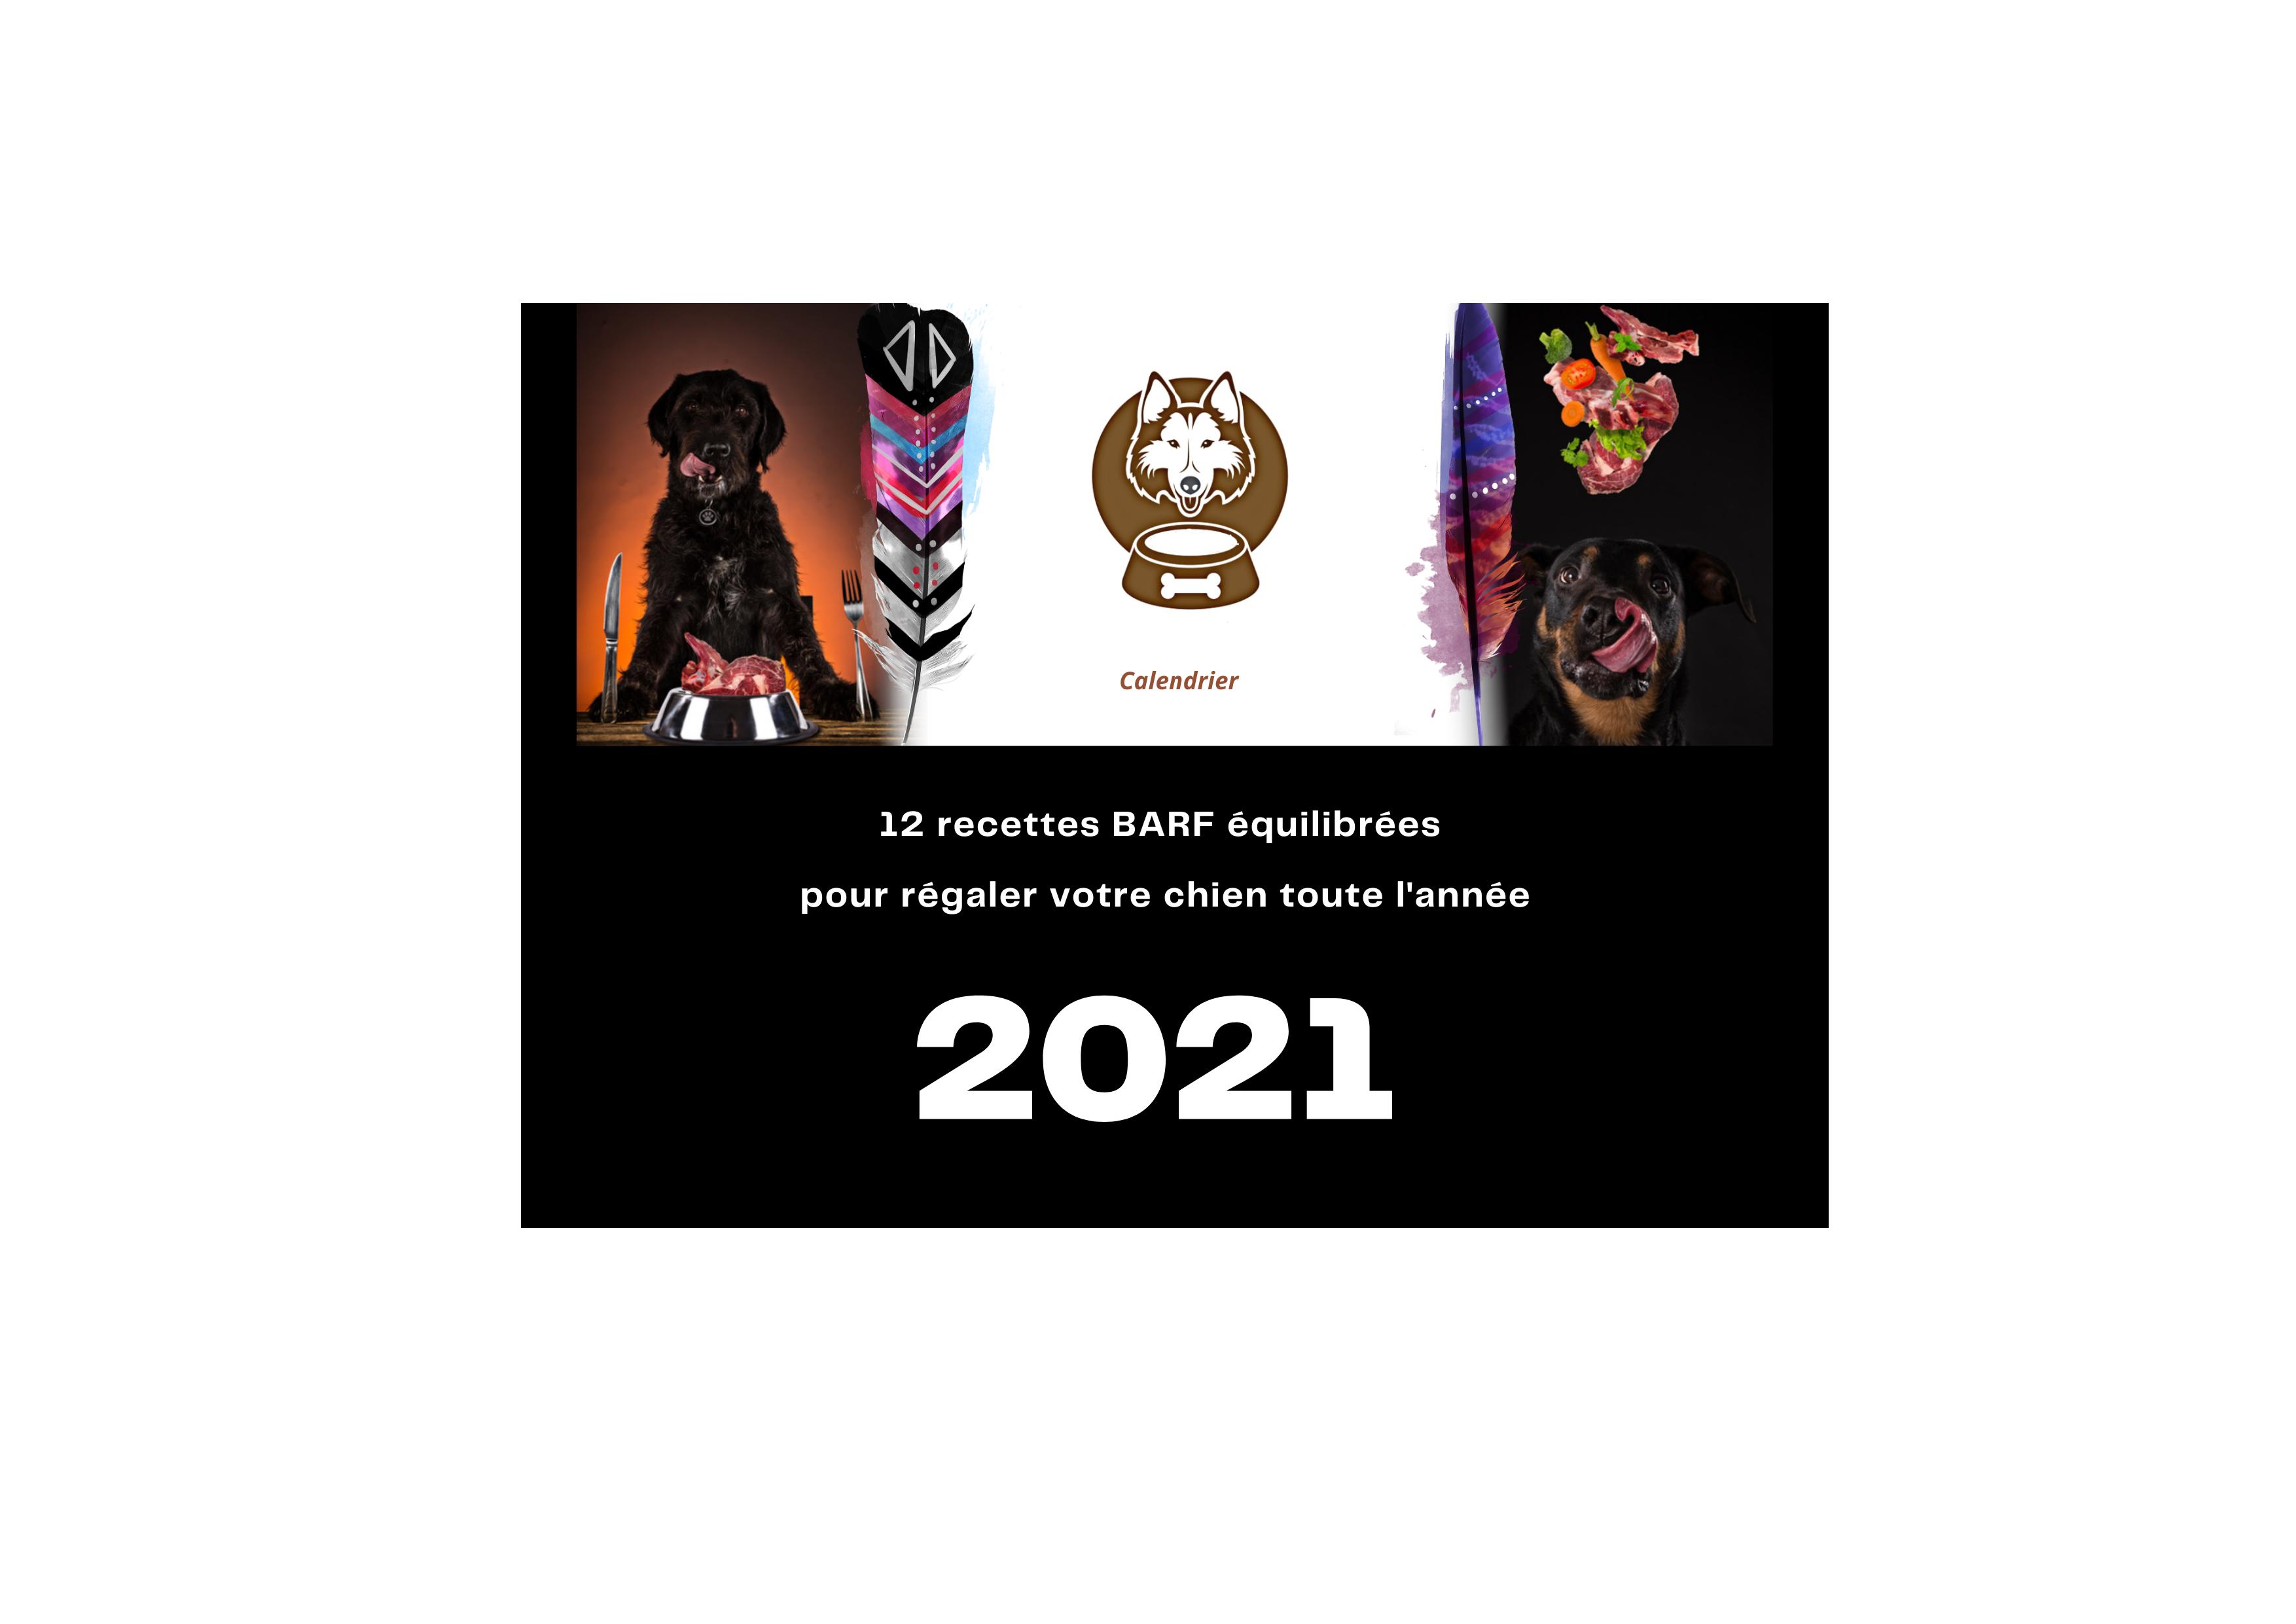 Calendrier du BARF 2021